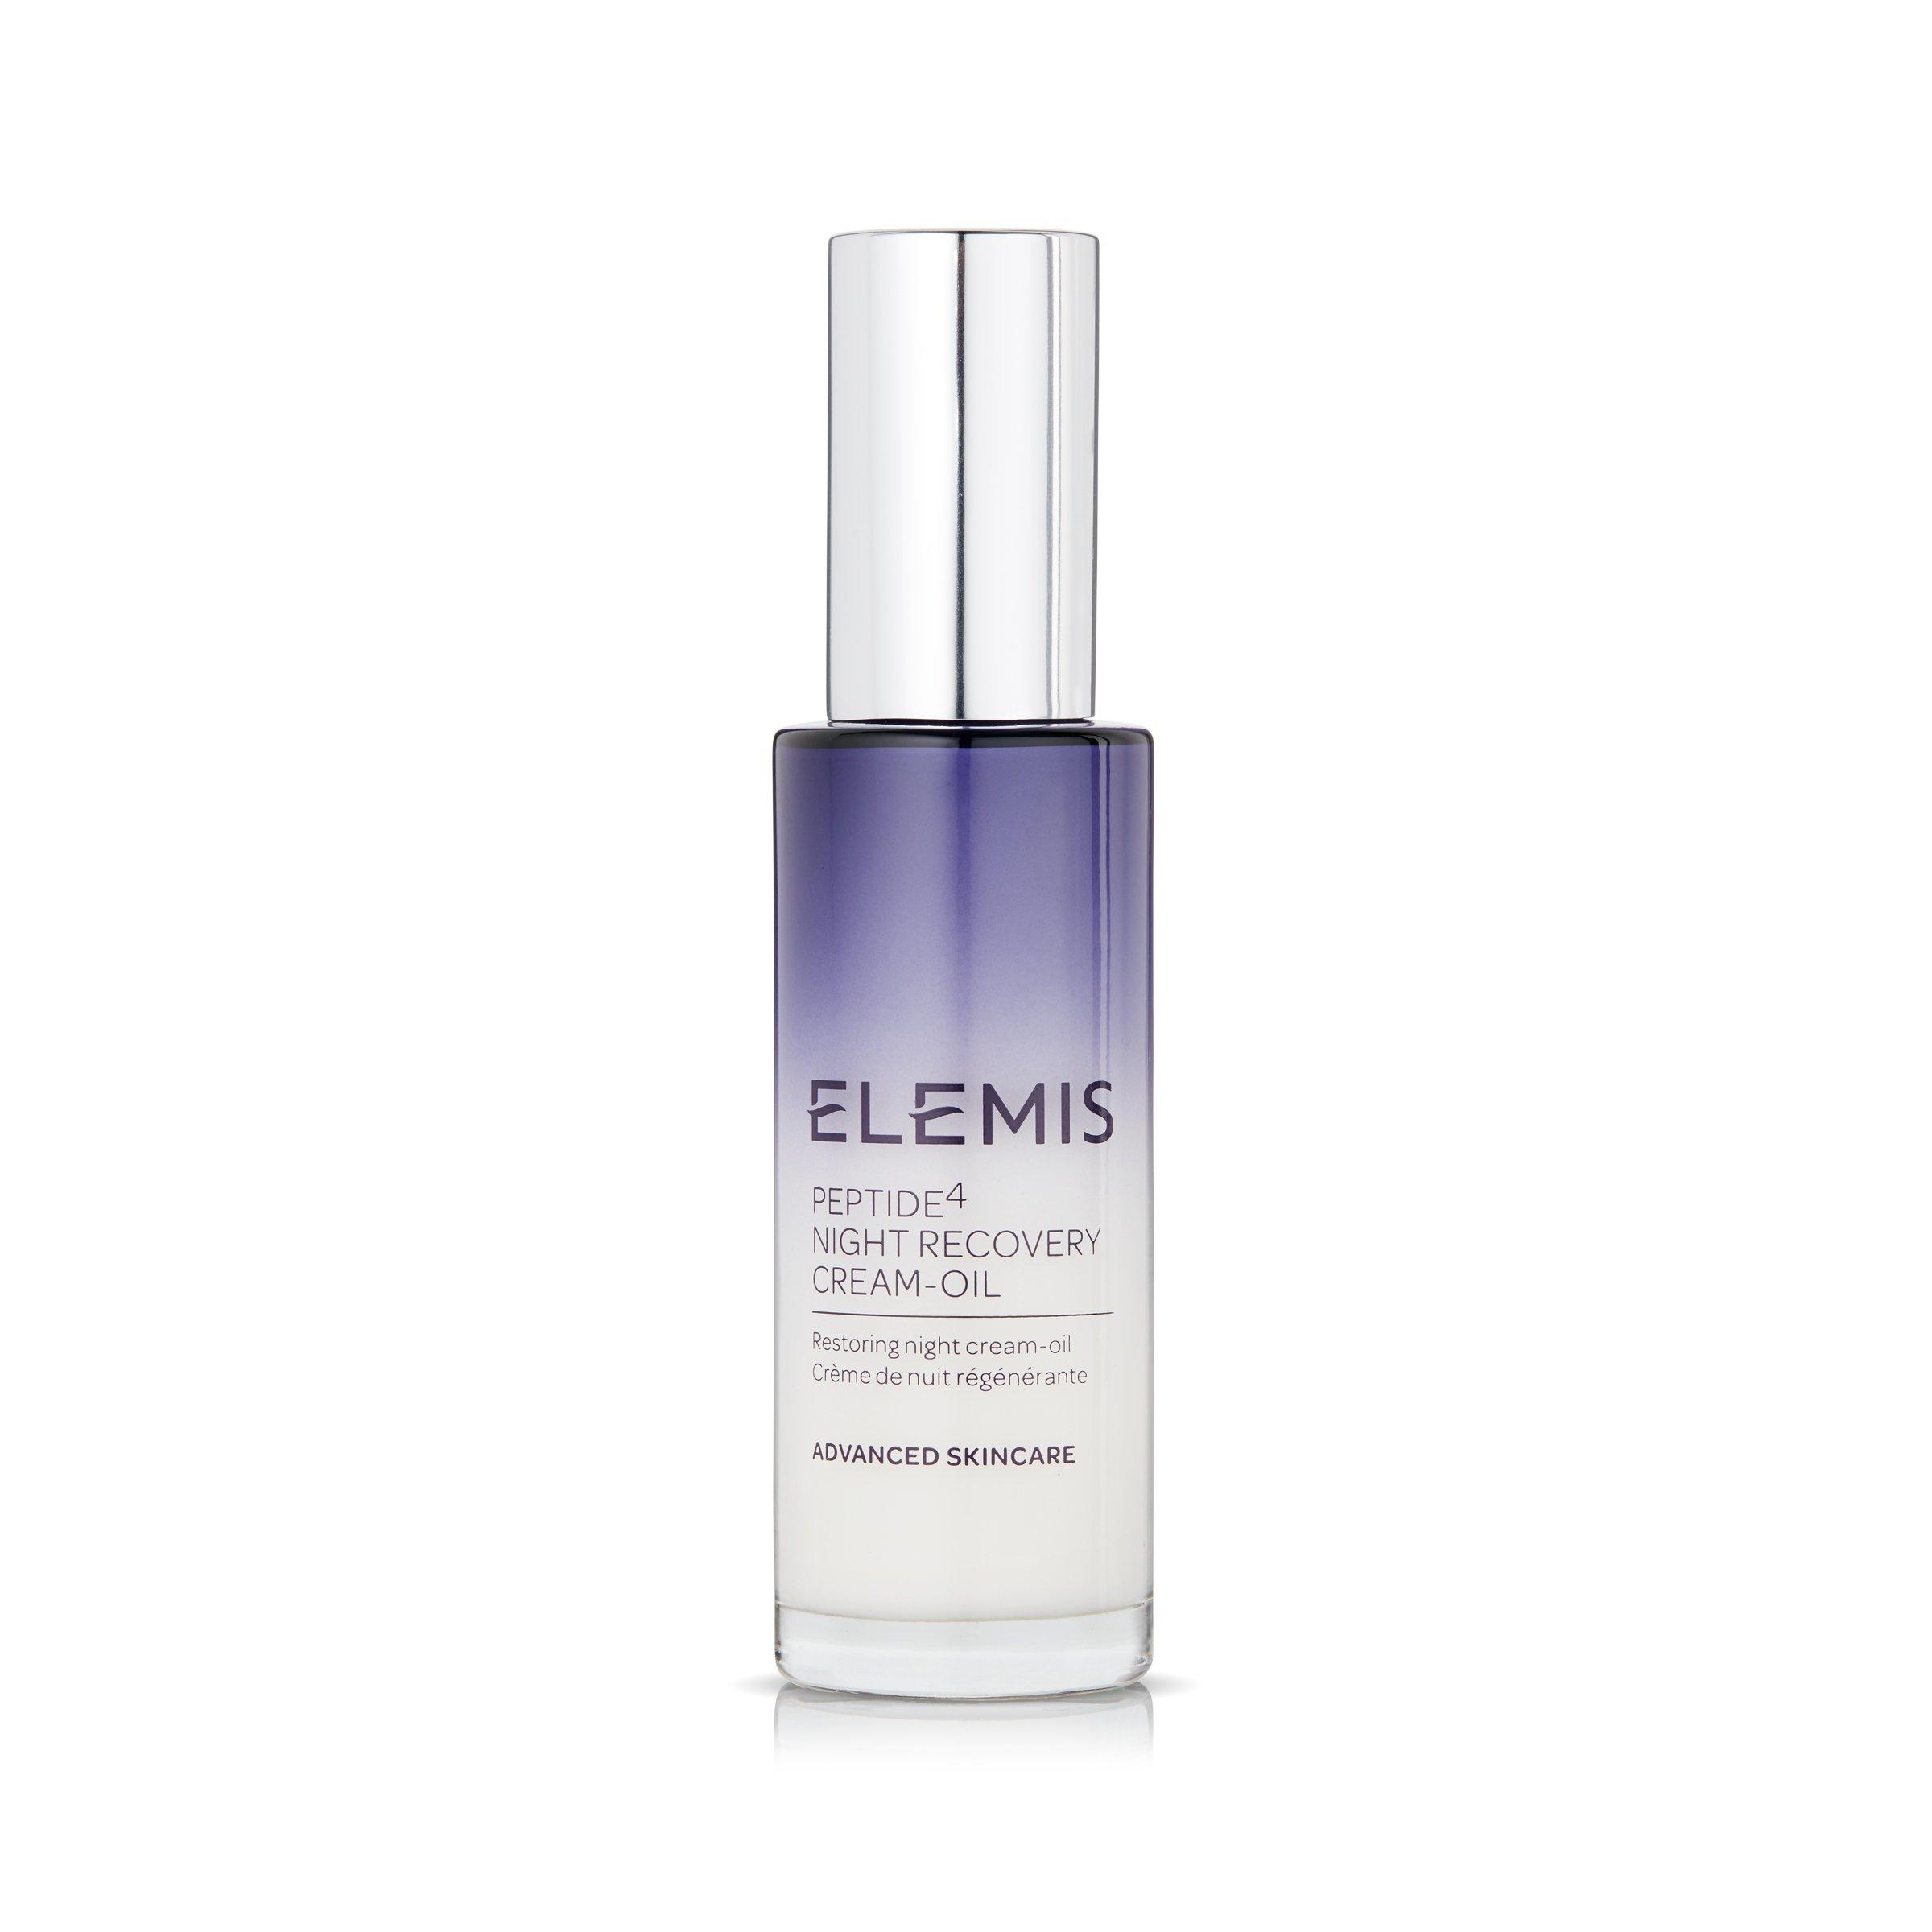 ELEMIS Peptide⁴ Night Recovery Cream-Oil, Restoring Night Cream-Oil, 1.0 fl. oz